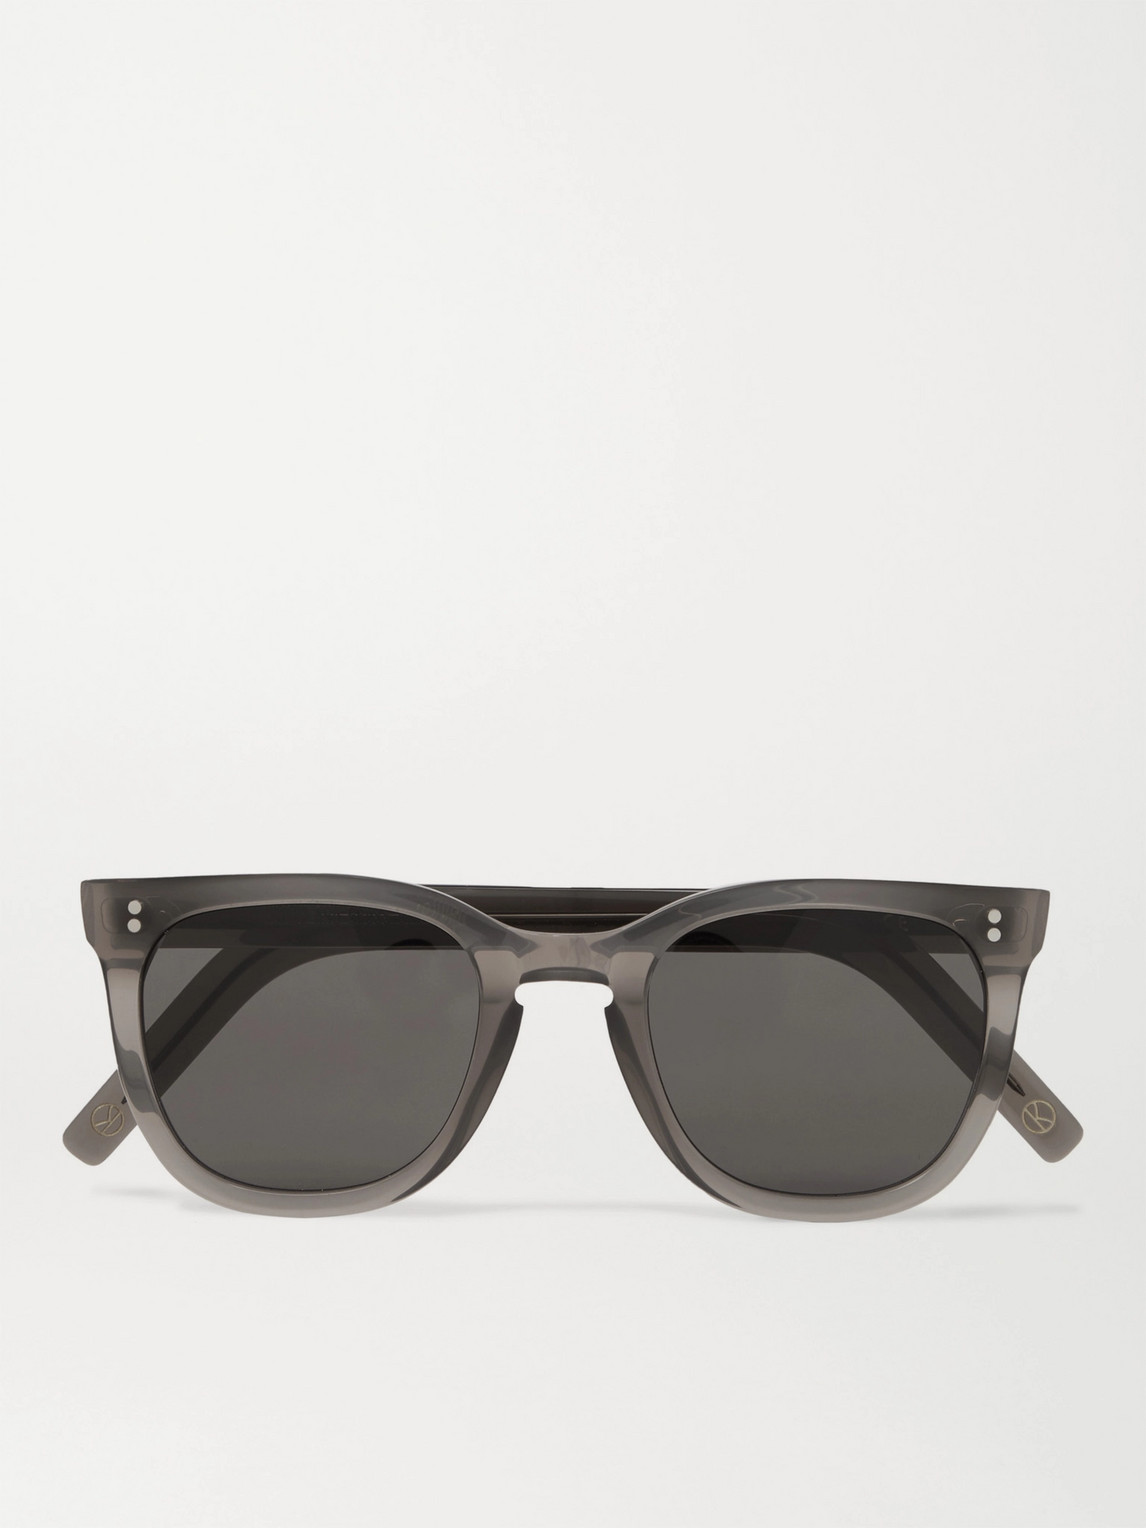 Kingsman Cutler And Gross D-frame Acetate Sunglasses In Gray